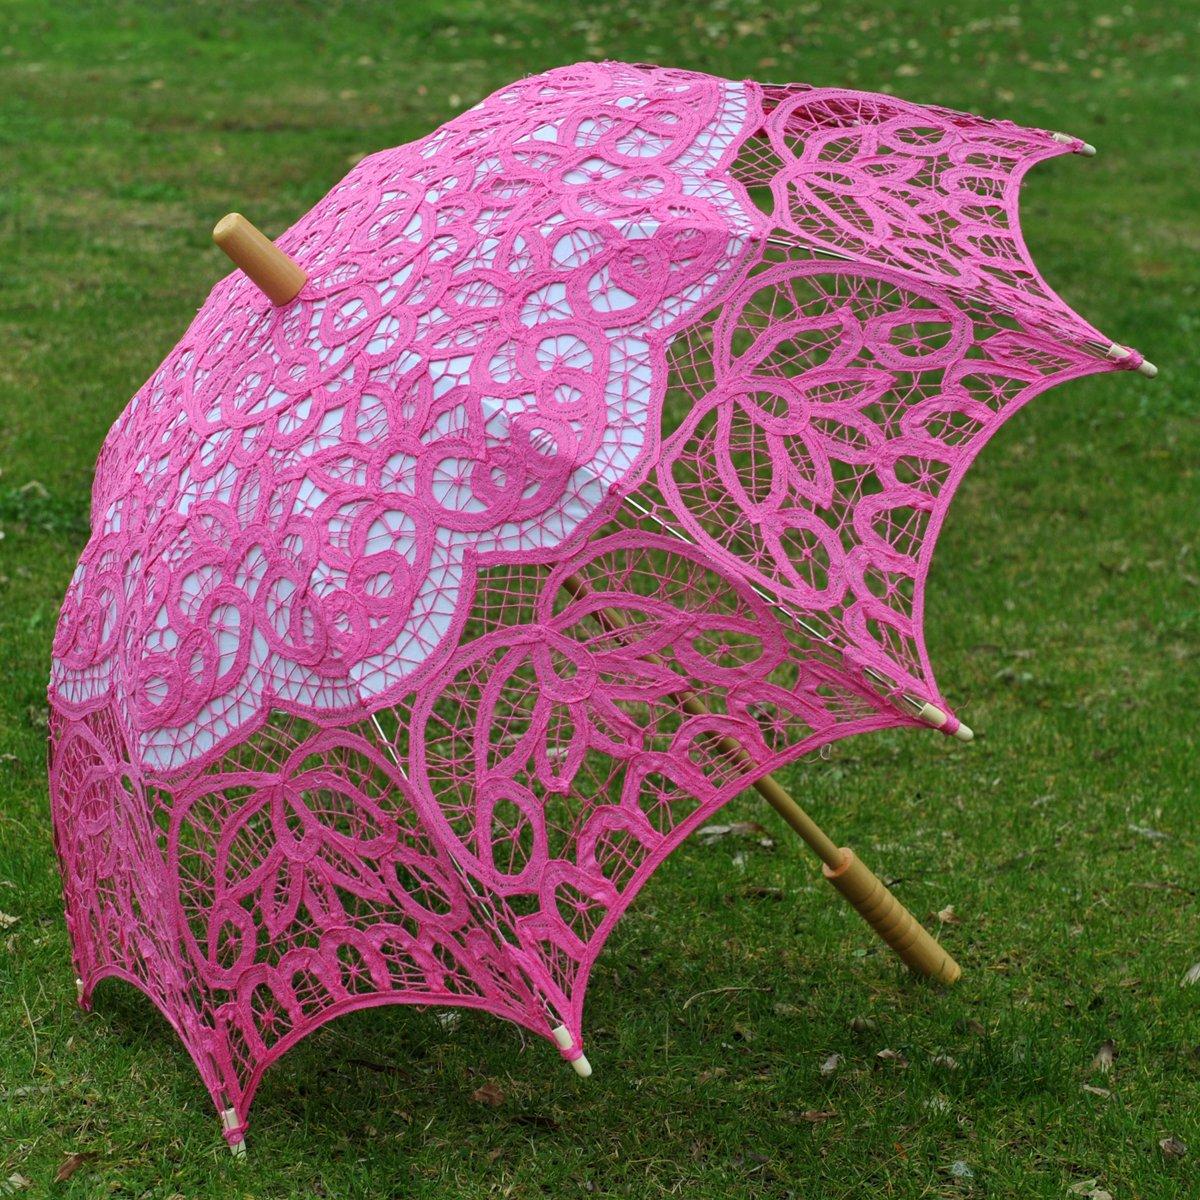 Topwedding Classic Cotton Lace Parasol Umbrella Bridal Shower Decoration, Fuschia by Topwedding (Image #2)